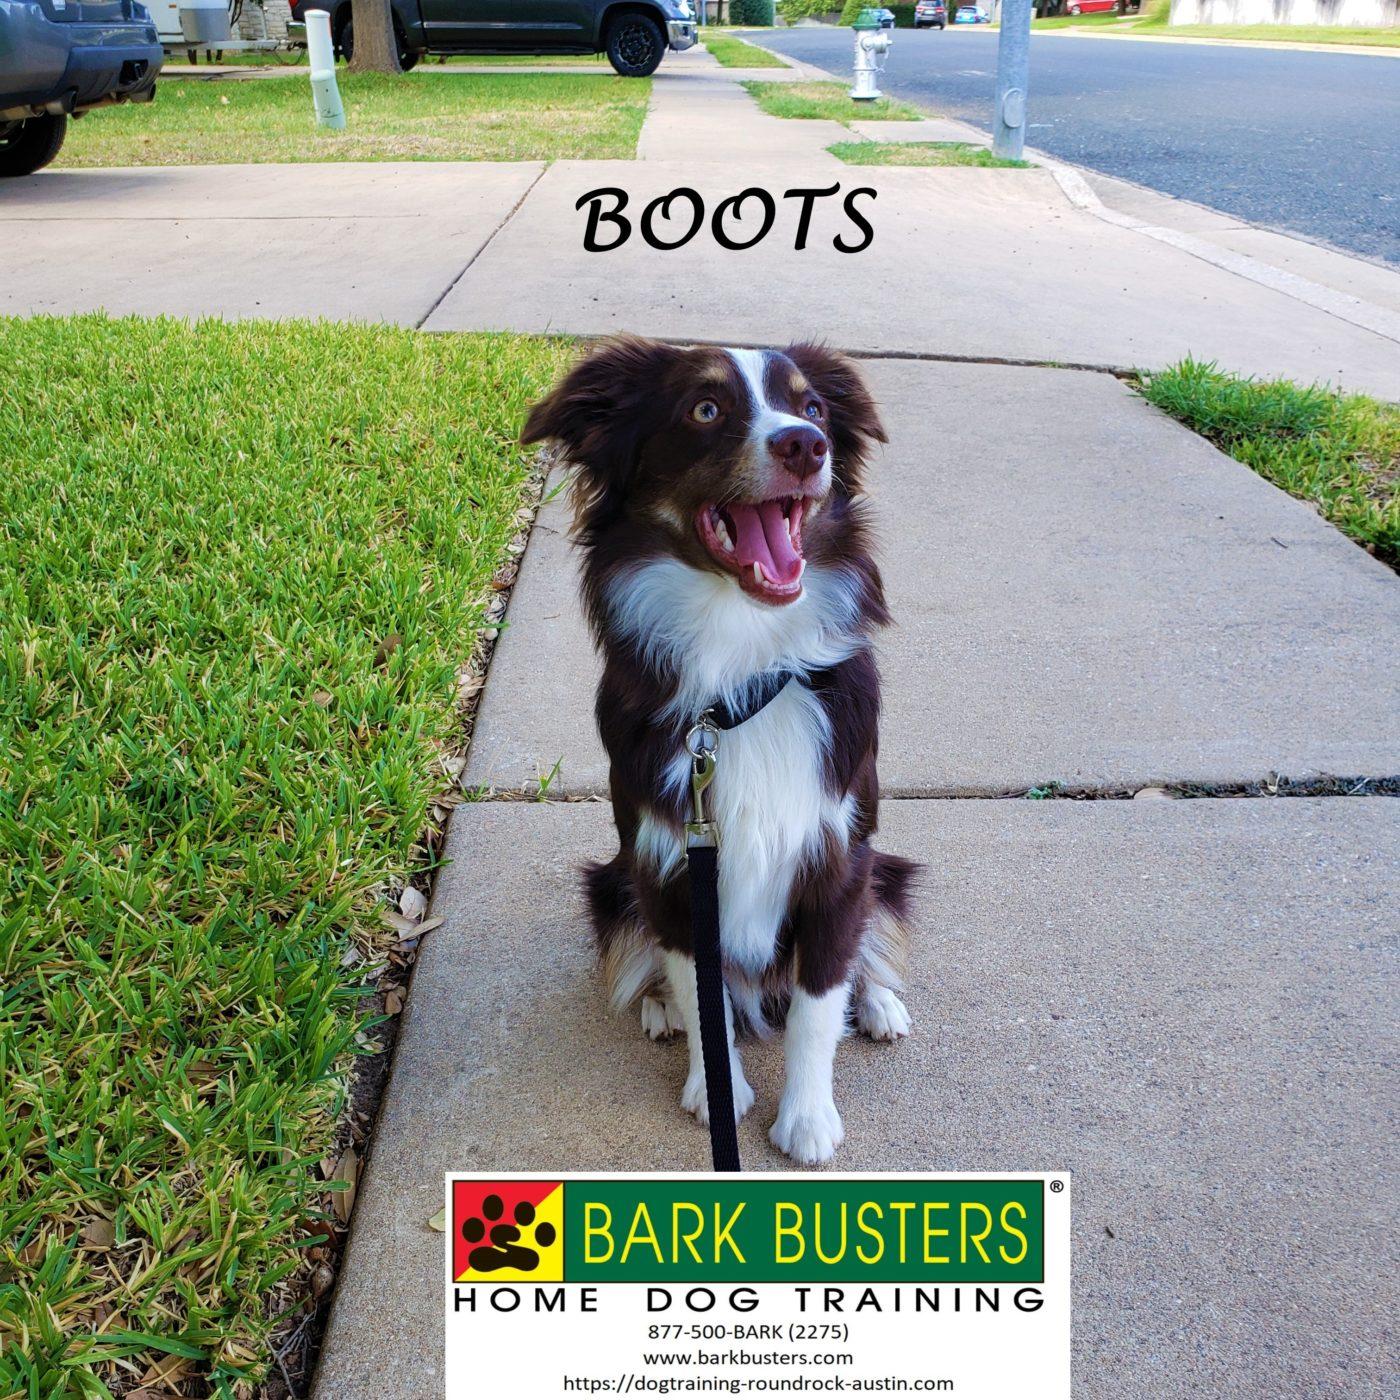 #miniaussie #leashmanners #obediencetraining #dogtrainingaustin #dogsofbarkbusters #speakdog #inhomedogtraining